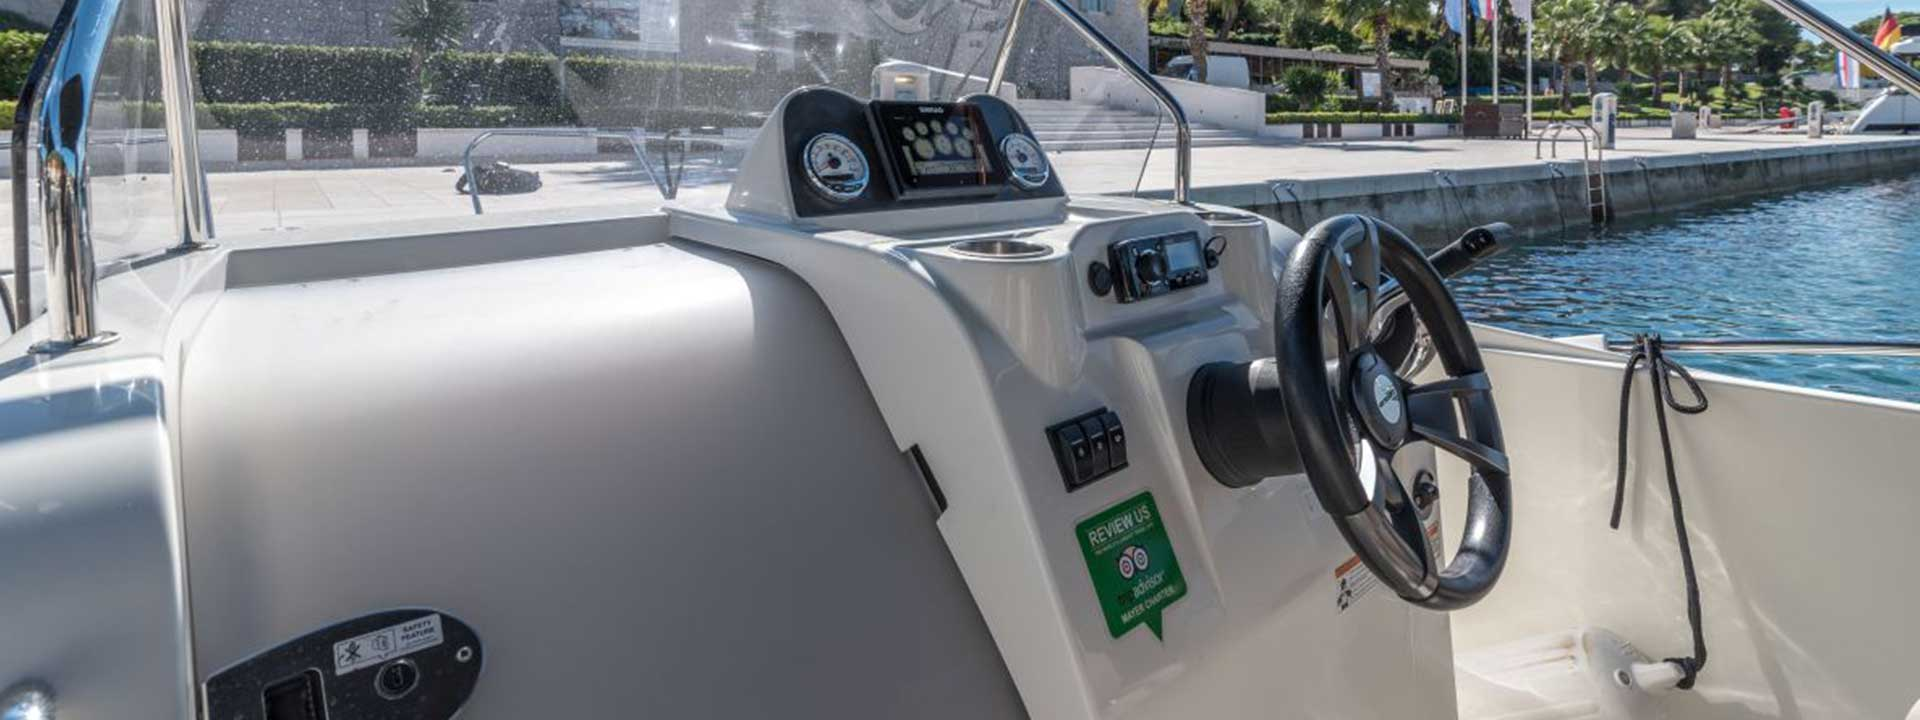 mayer-charter-boat-header-quicksilver-activ-675-open-04